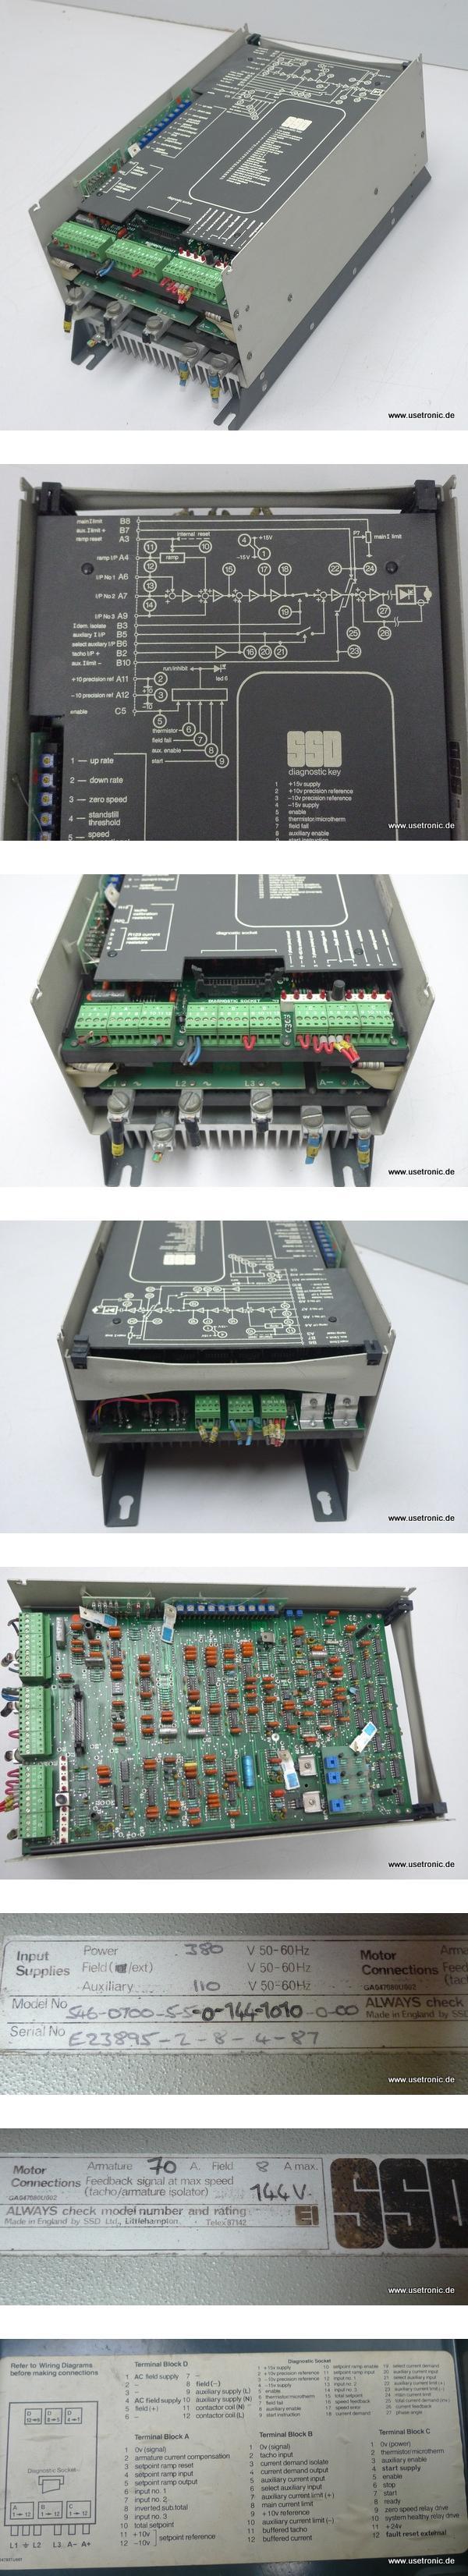 SSD Parker Controller 546-0700-5-5-0-144-1010-0-00 380V 70A